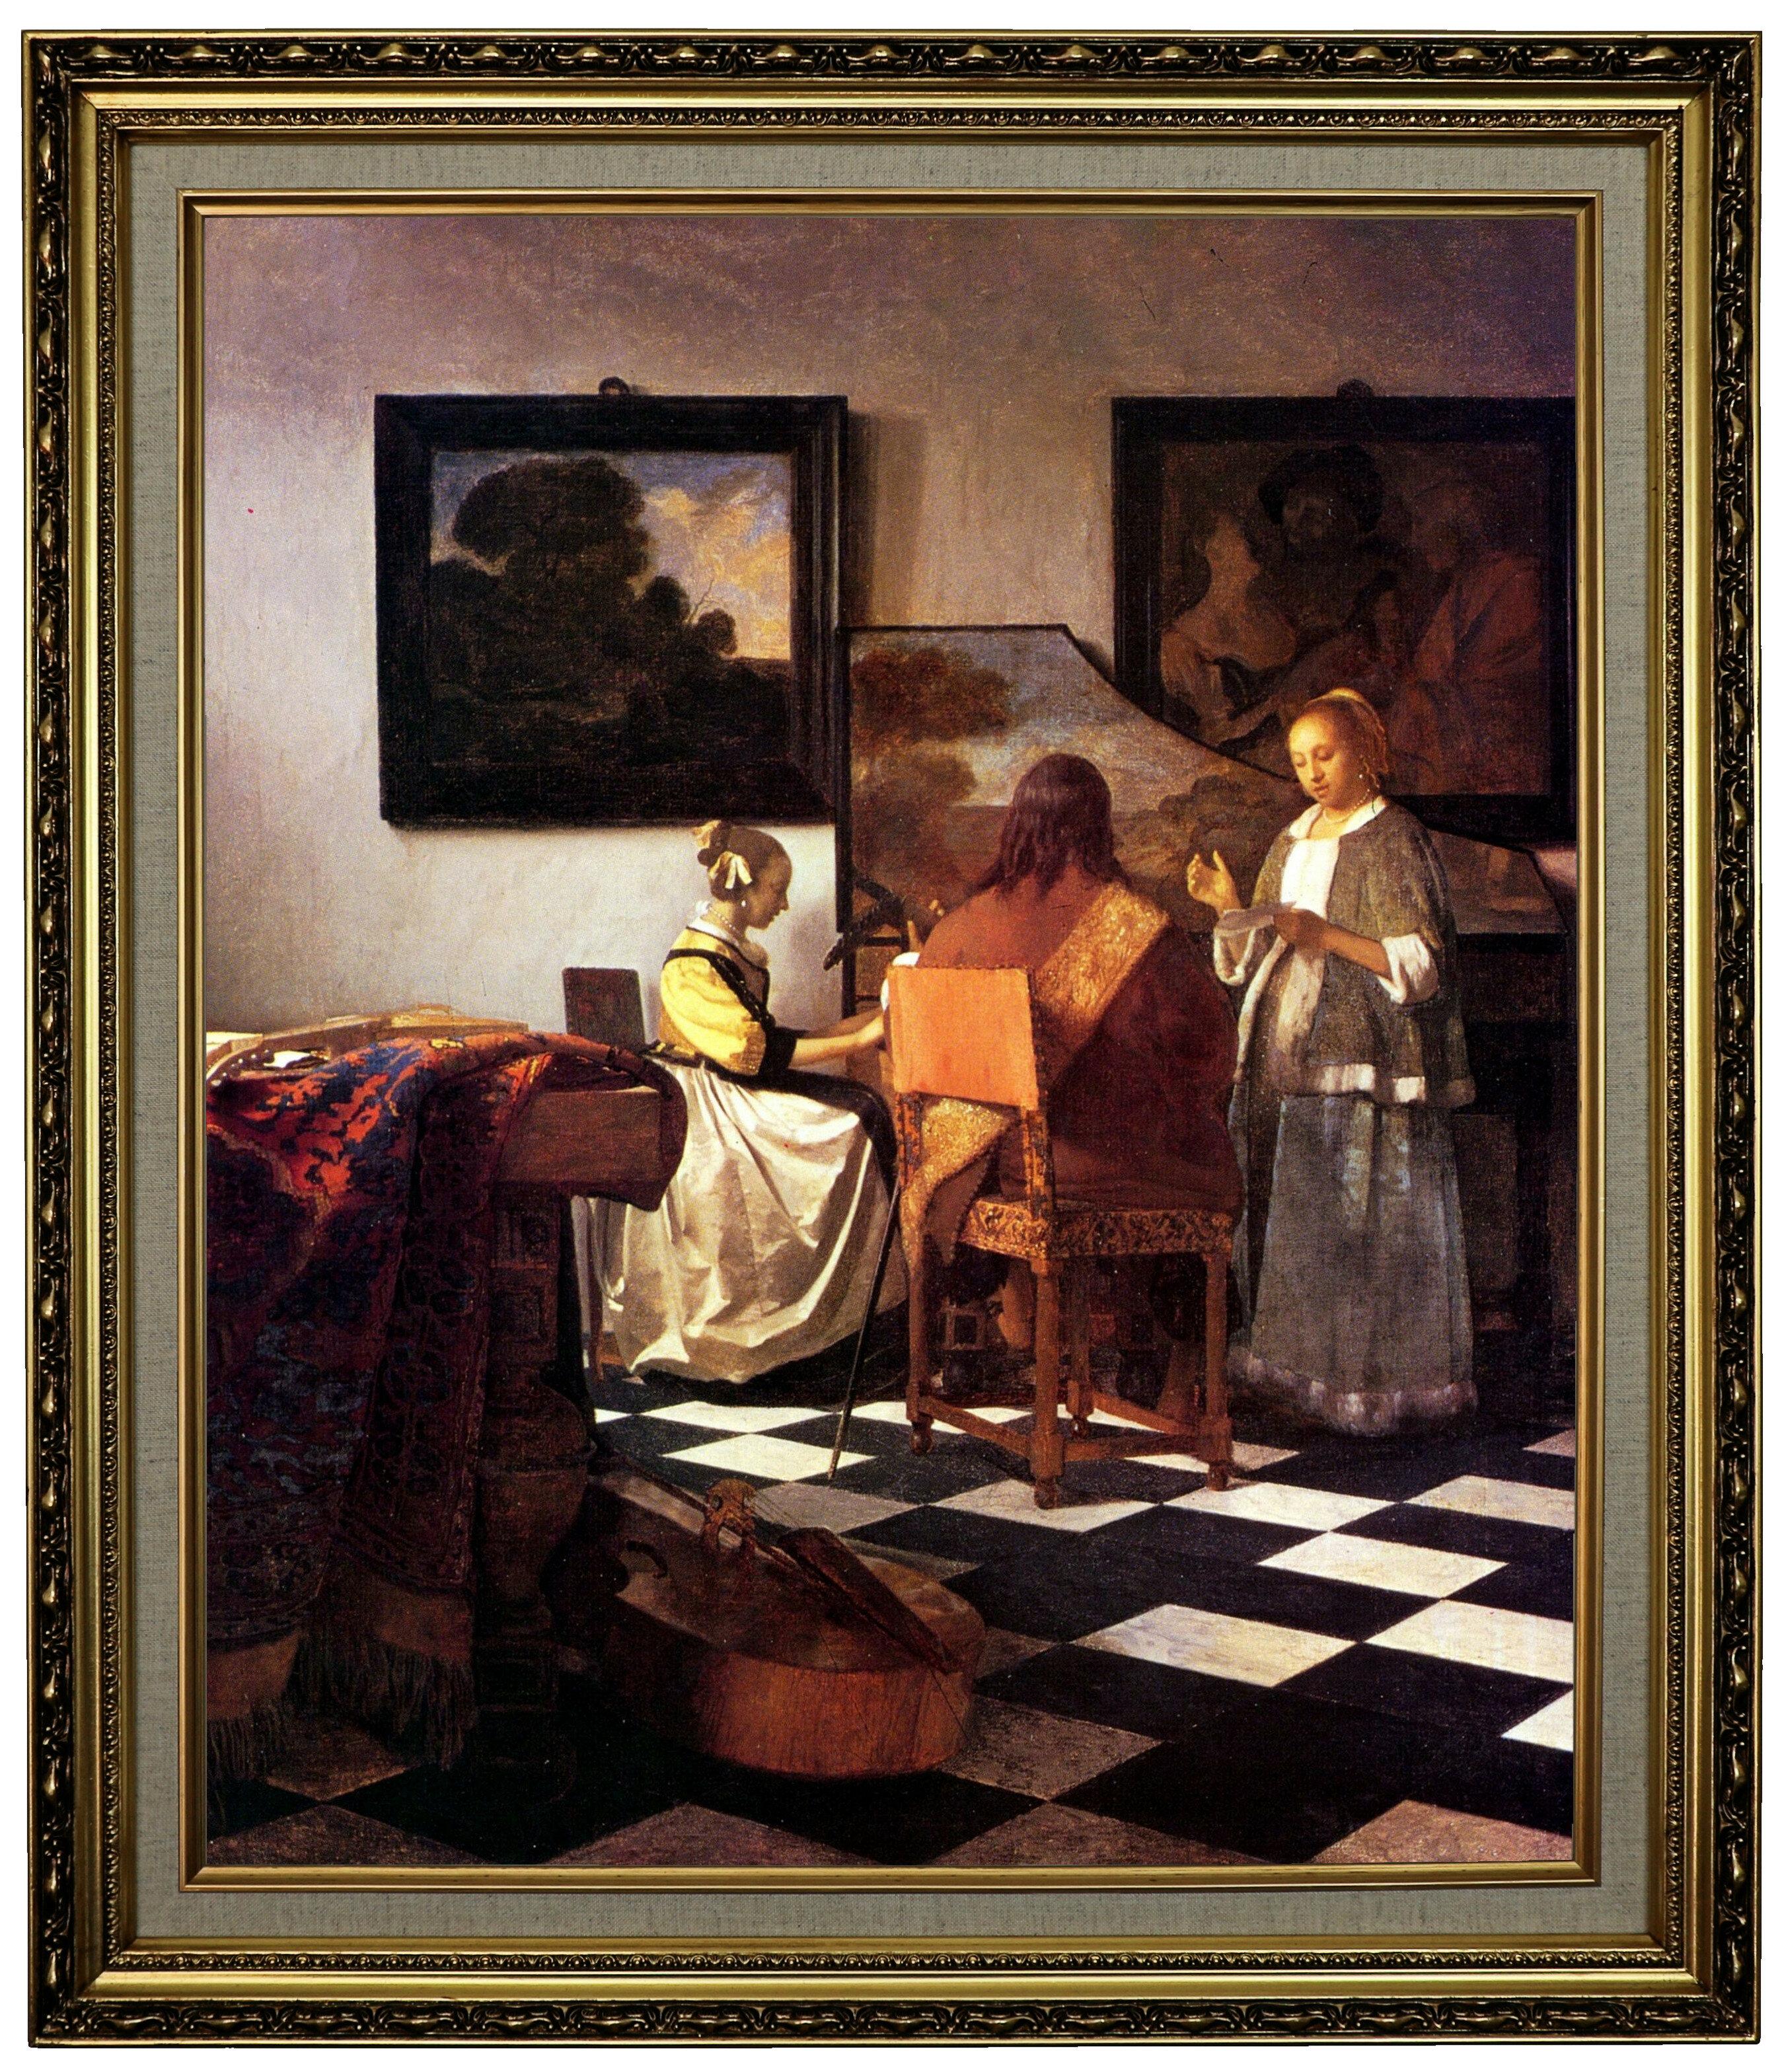 Vault W Artwork The Concert Stolen Framed Oil Painting Print On Canvas Wayfair